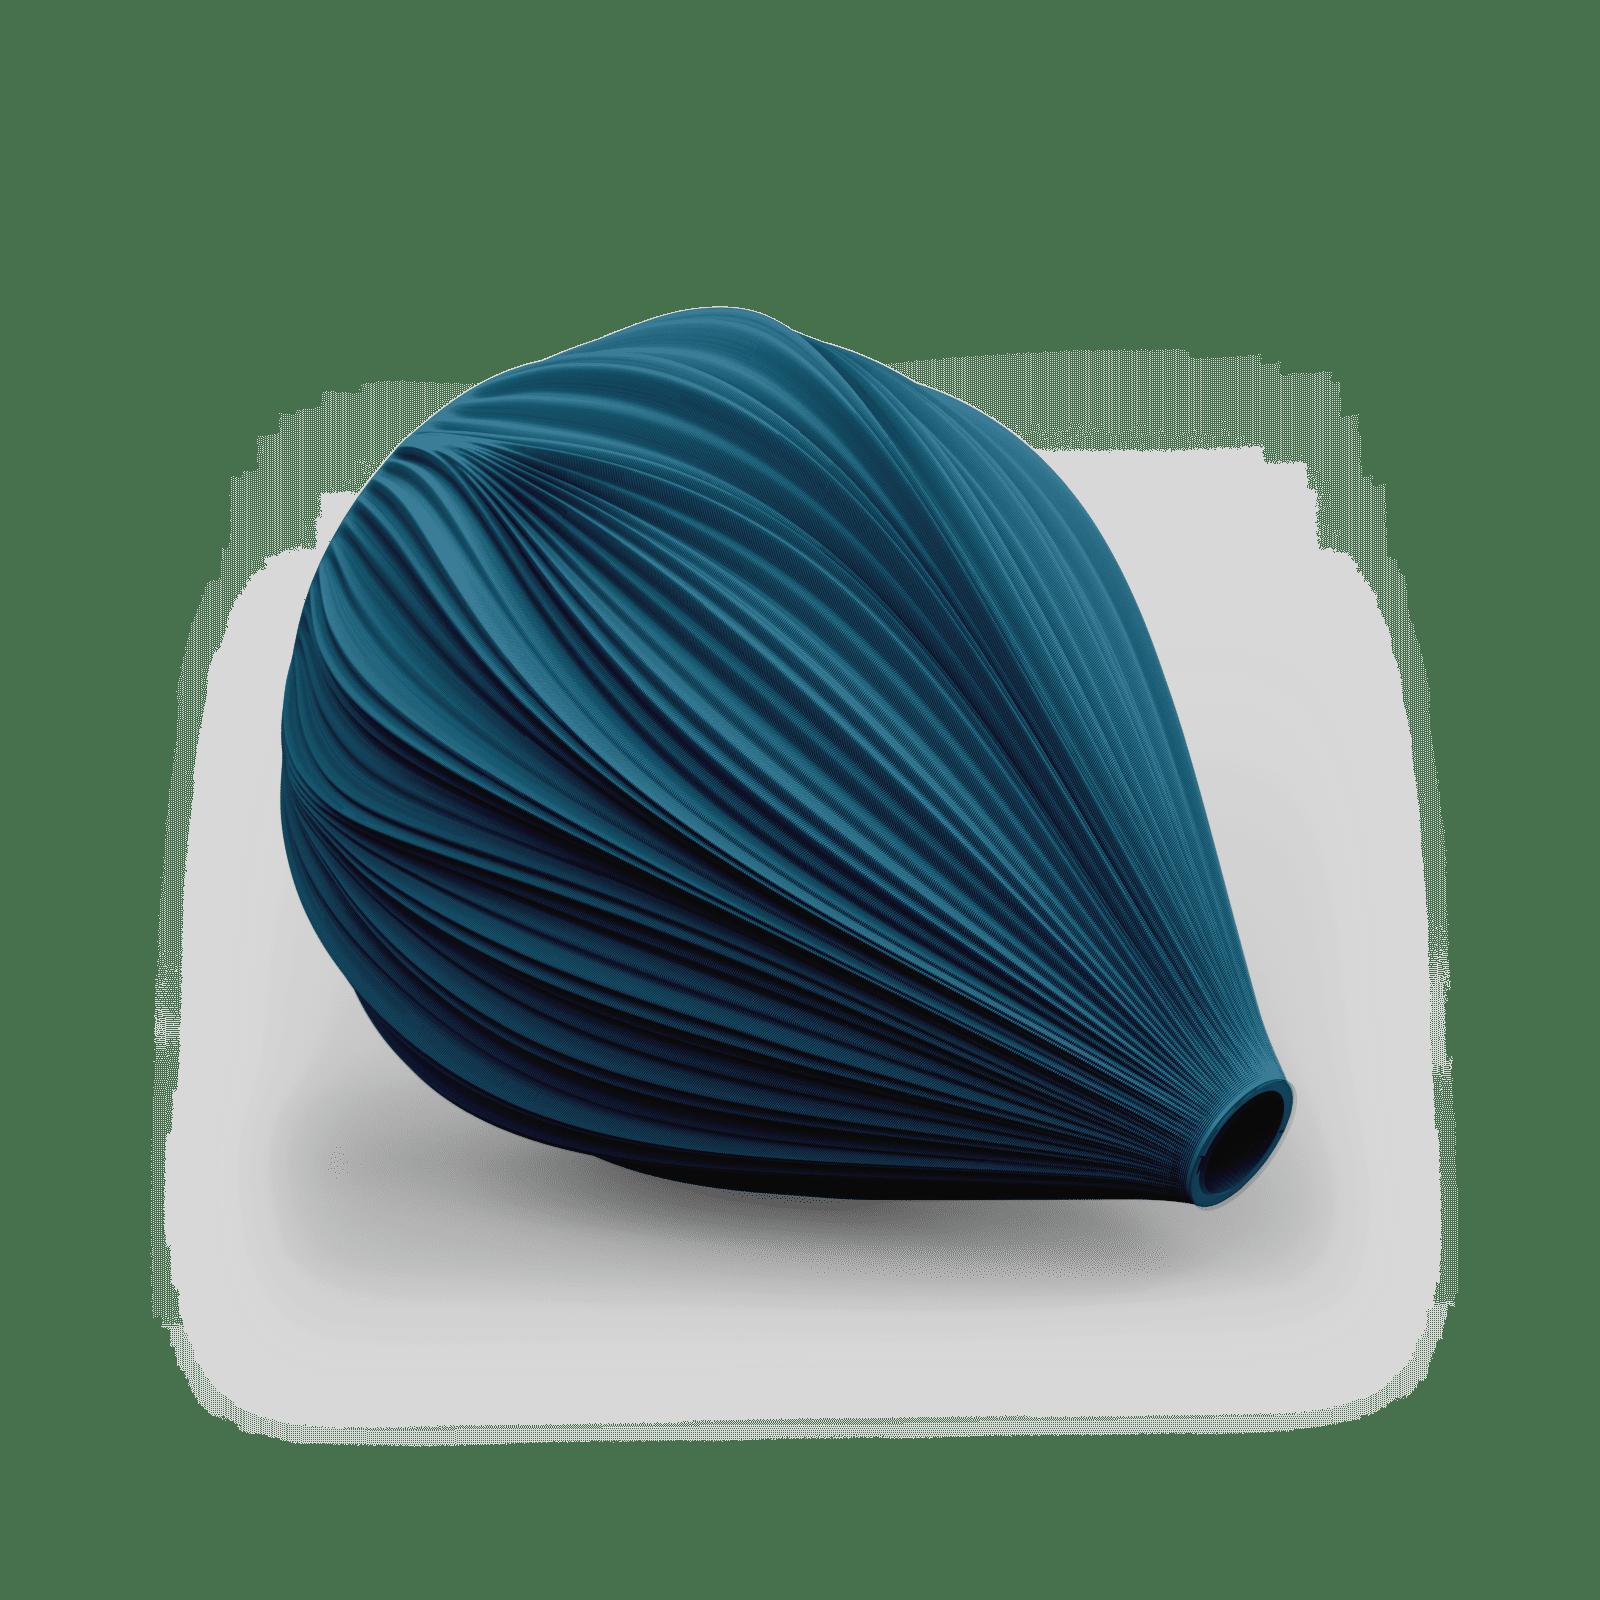 FALD 169g Mosaic Blue PNG 1